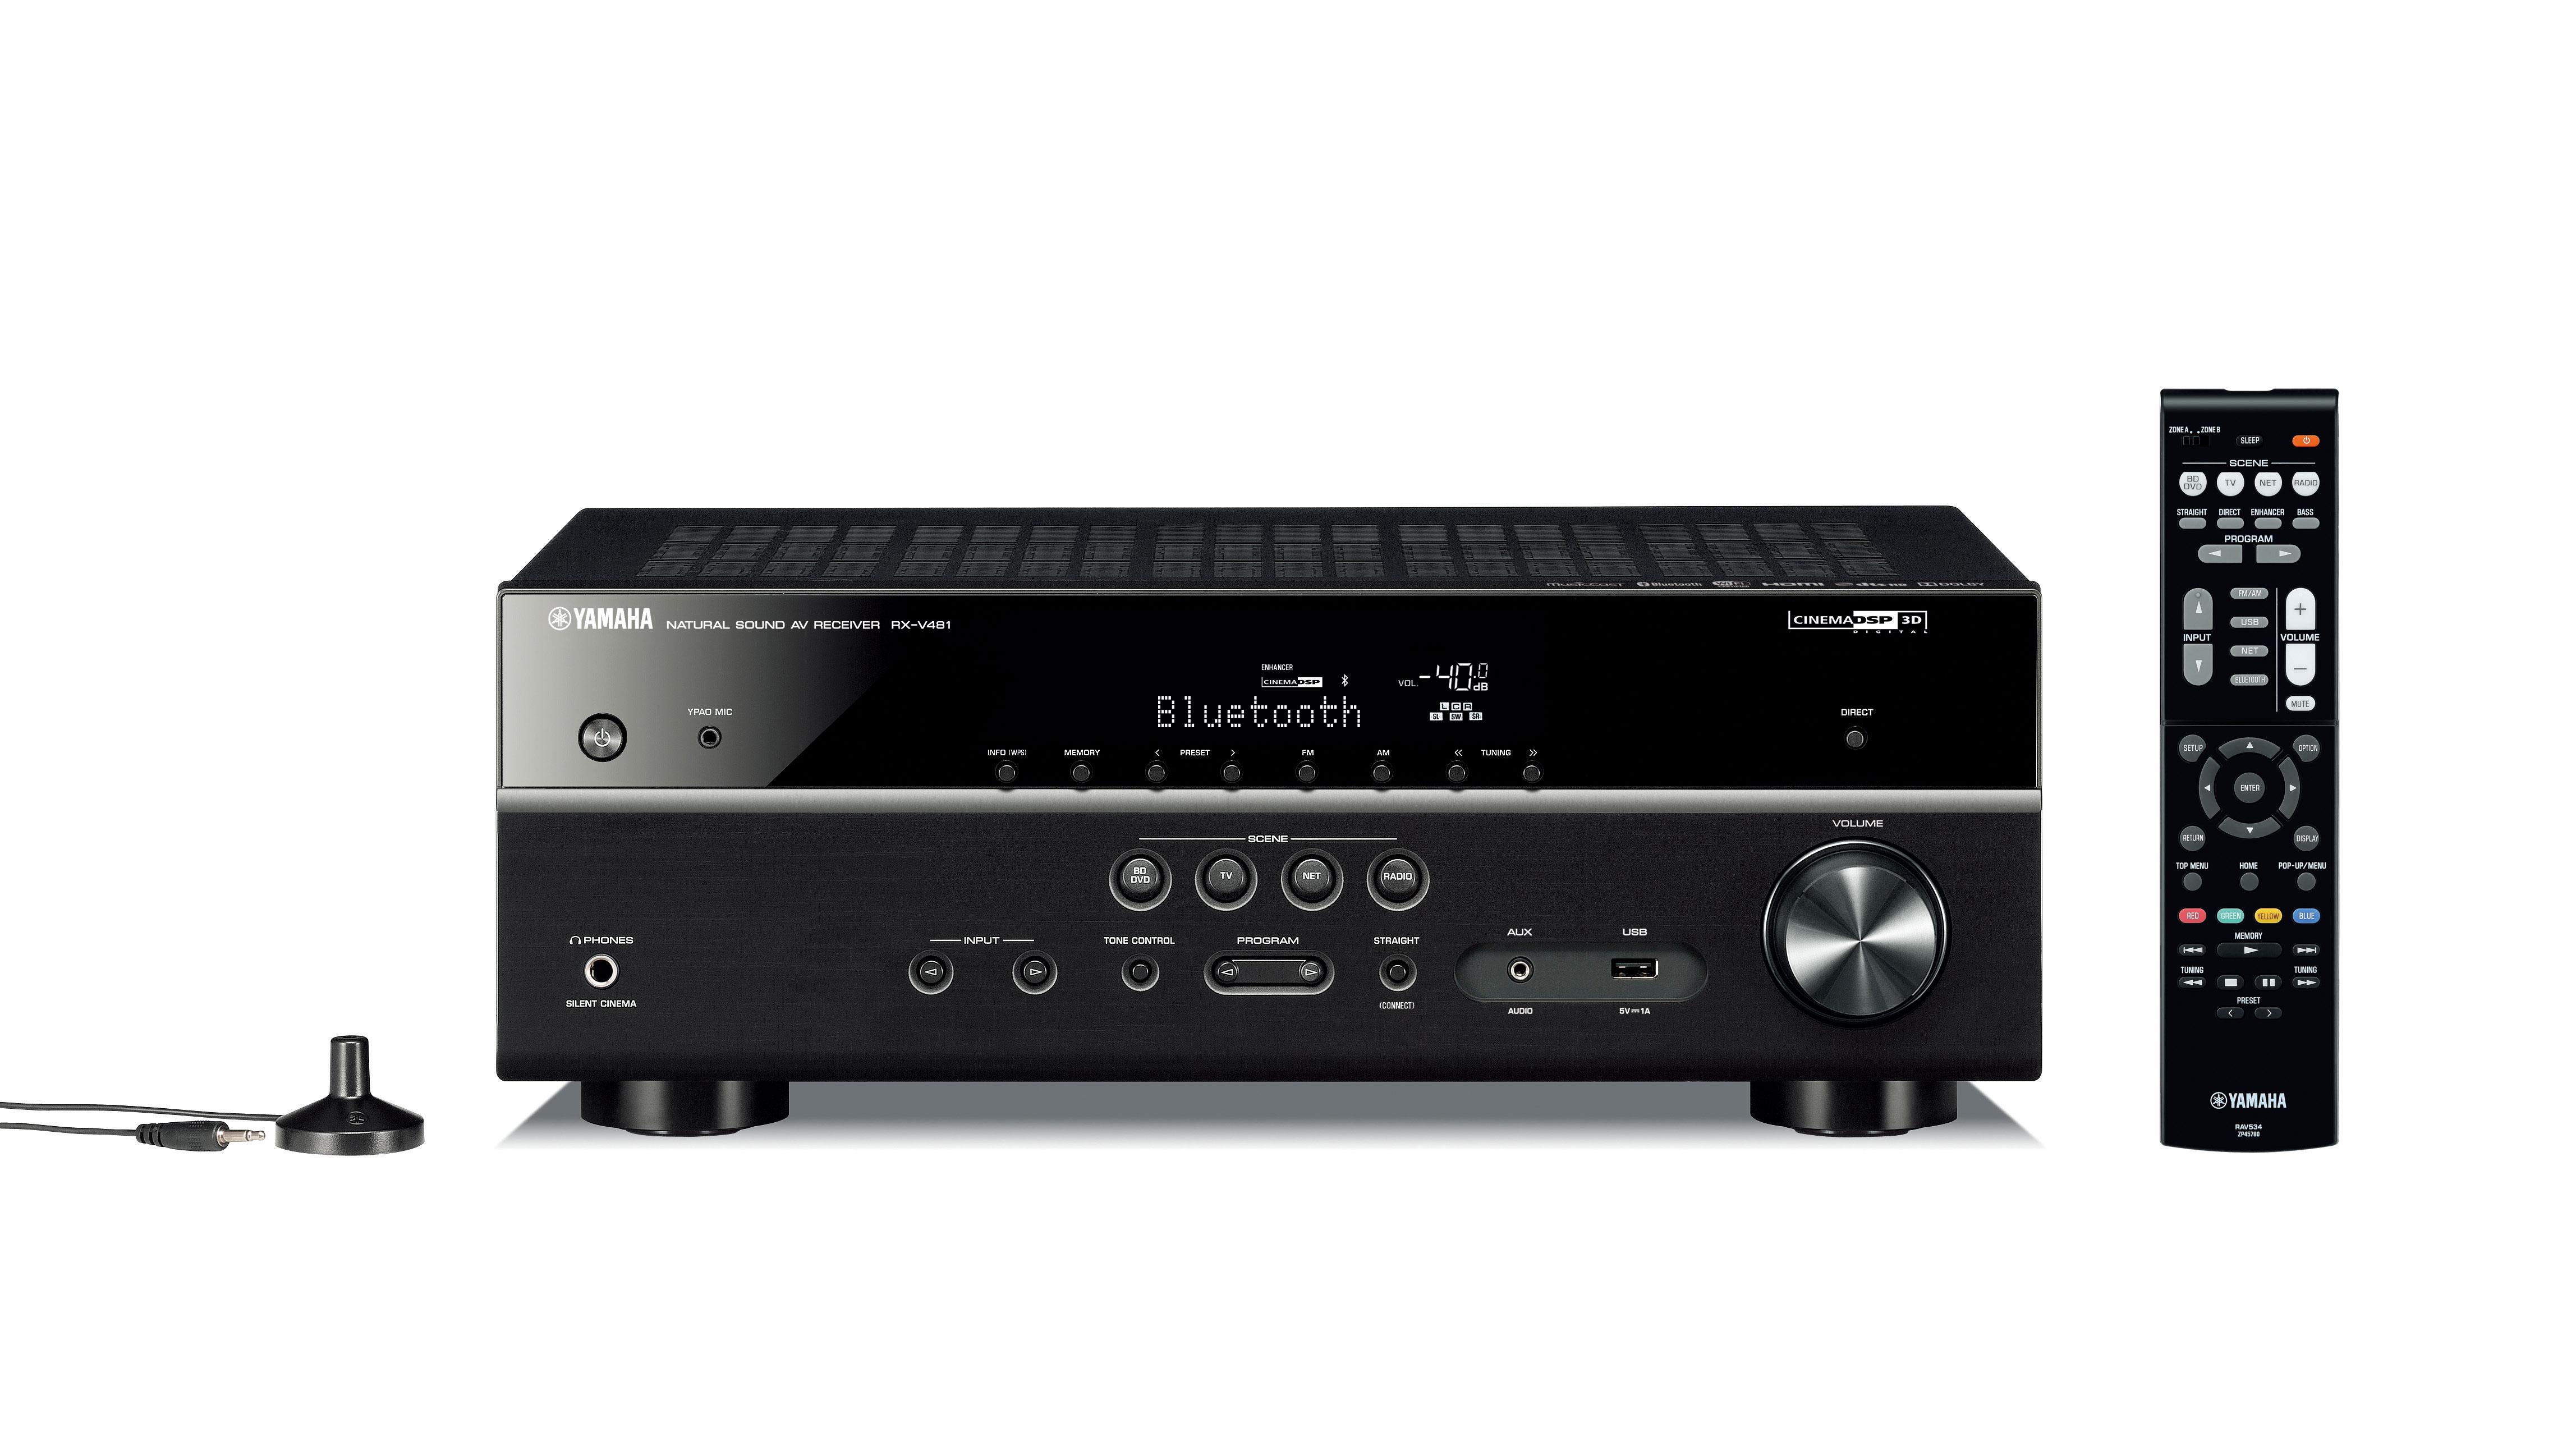 Yamaha RX-V481 Network AV Receiverw/ Bluetooth, Wi-F & MusicCast (Black)